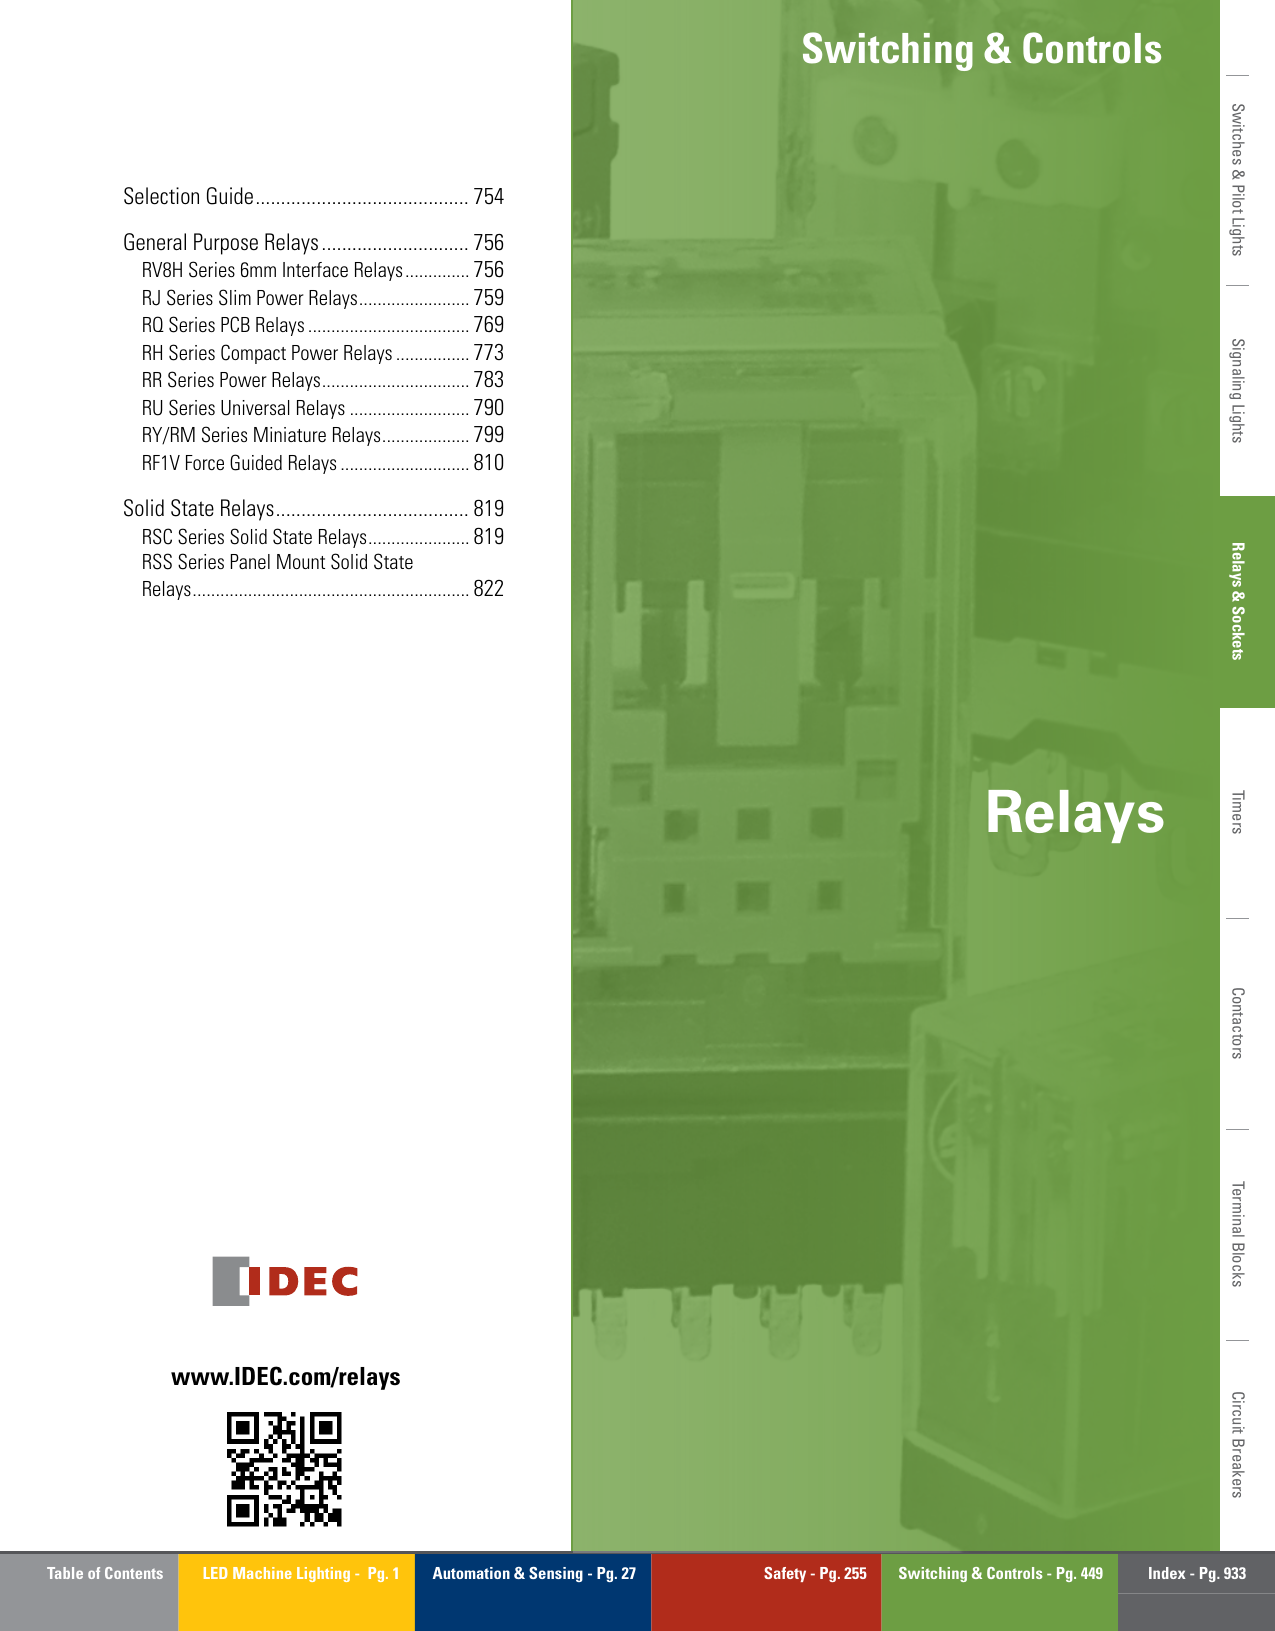 77EB2 Idec Relay Socket Wiring Diagram | Digital Resources on idec spdt relay, idec safety relay, idec relay schematic, idec smart relay, idec relay base, idec relay 24v, idec solid state relays,